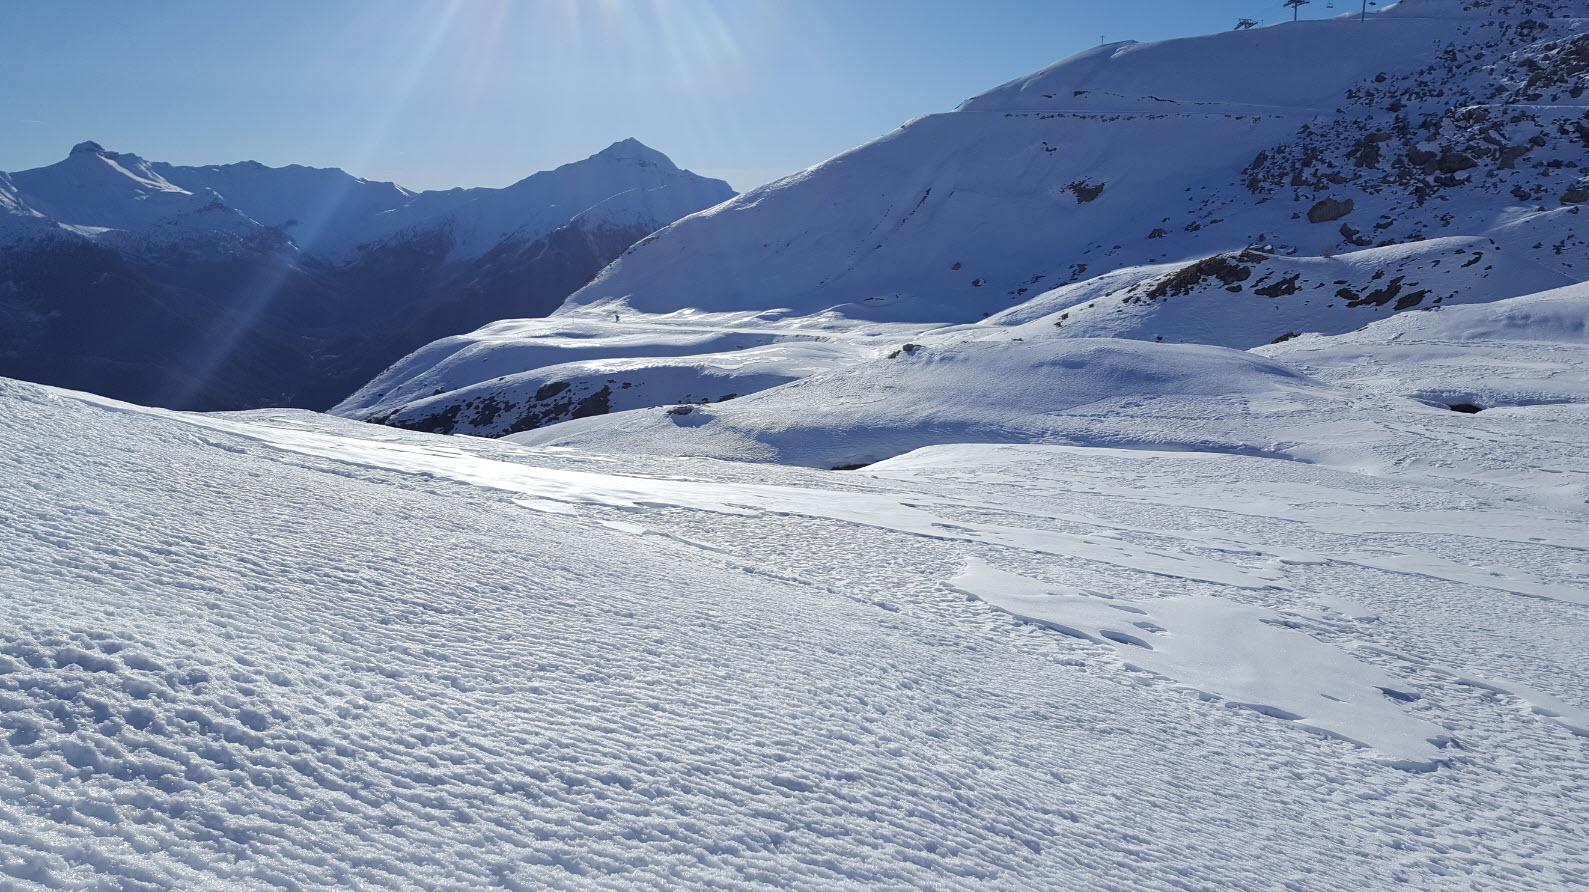 Orcieres-Merlette domaine skiable